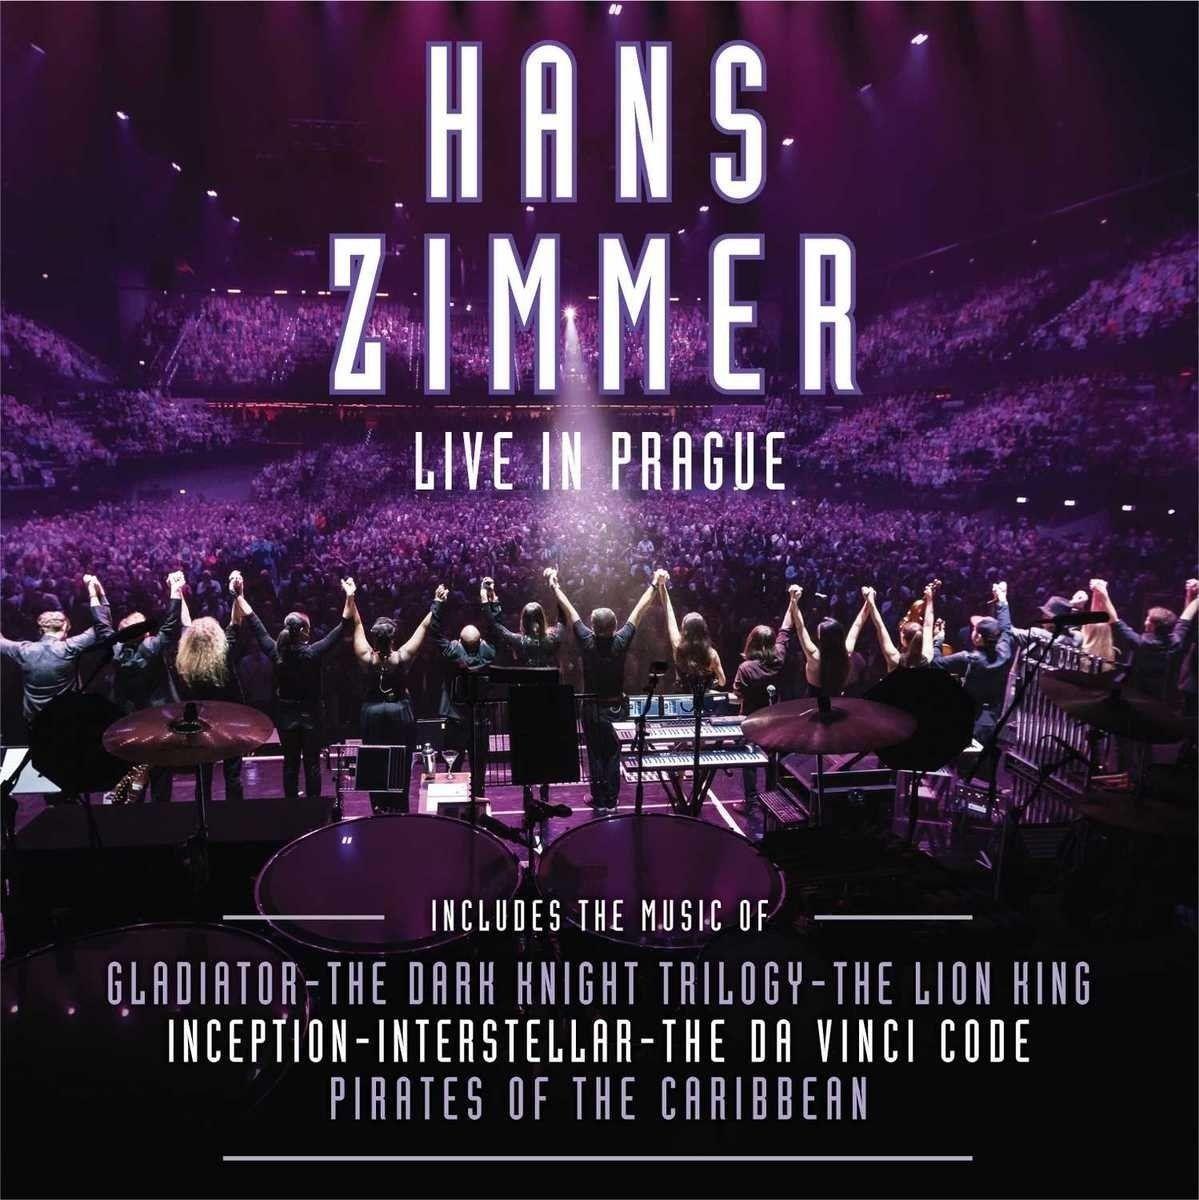 Hans Zimmer - Live In Prague album cover